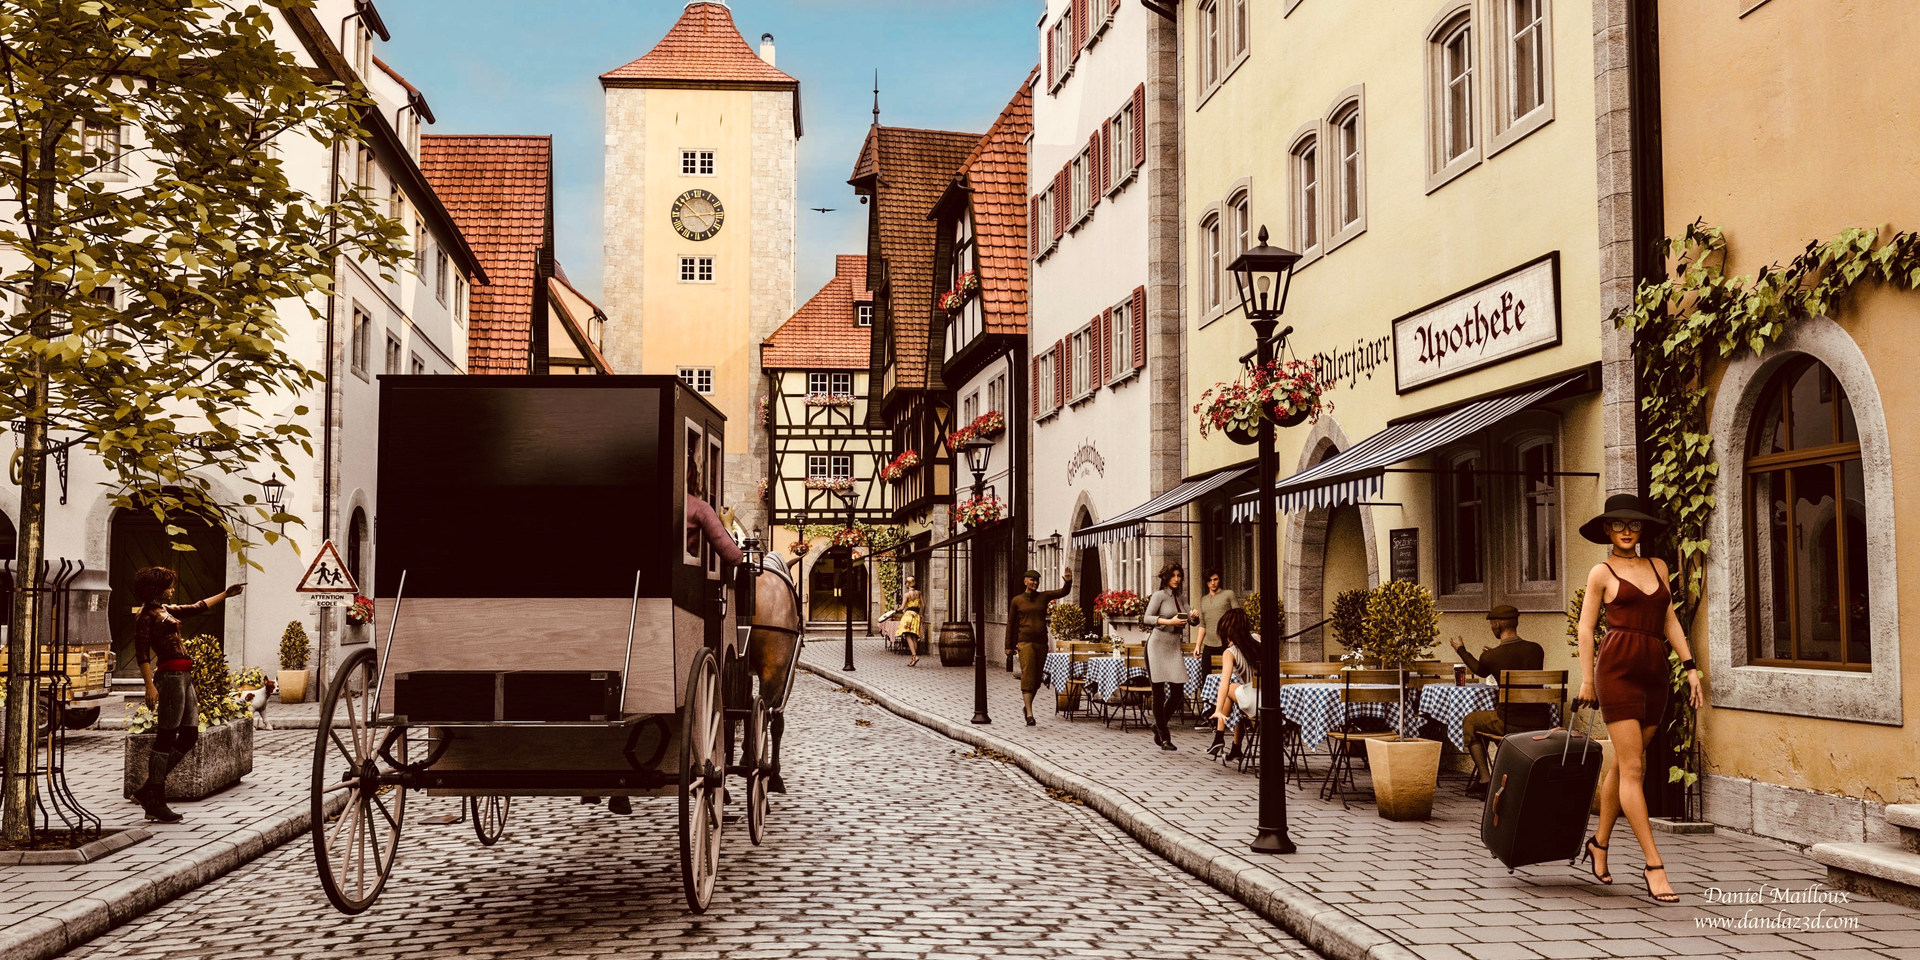 harpsburg sparks street